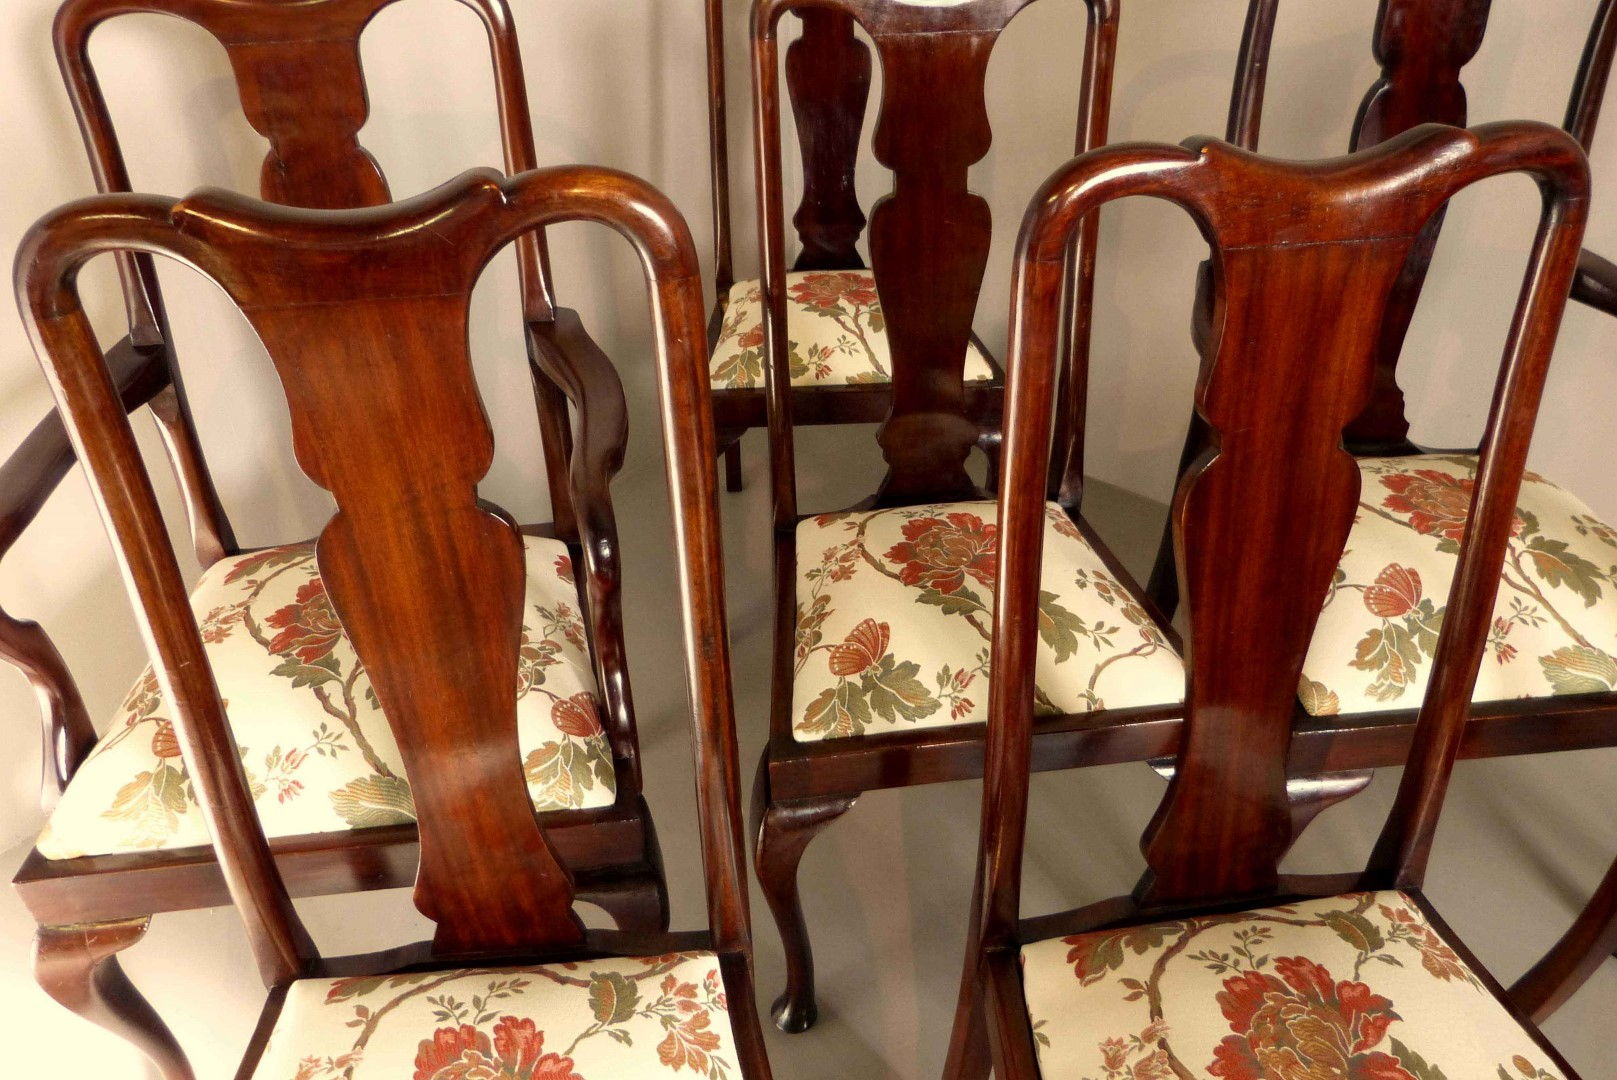 Muebles antiguos armarios antiguos mesas antiguas c modas antiguas sillones antiguos for Quiero ver muebles